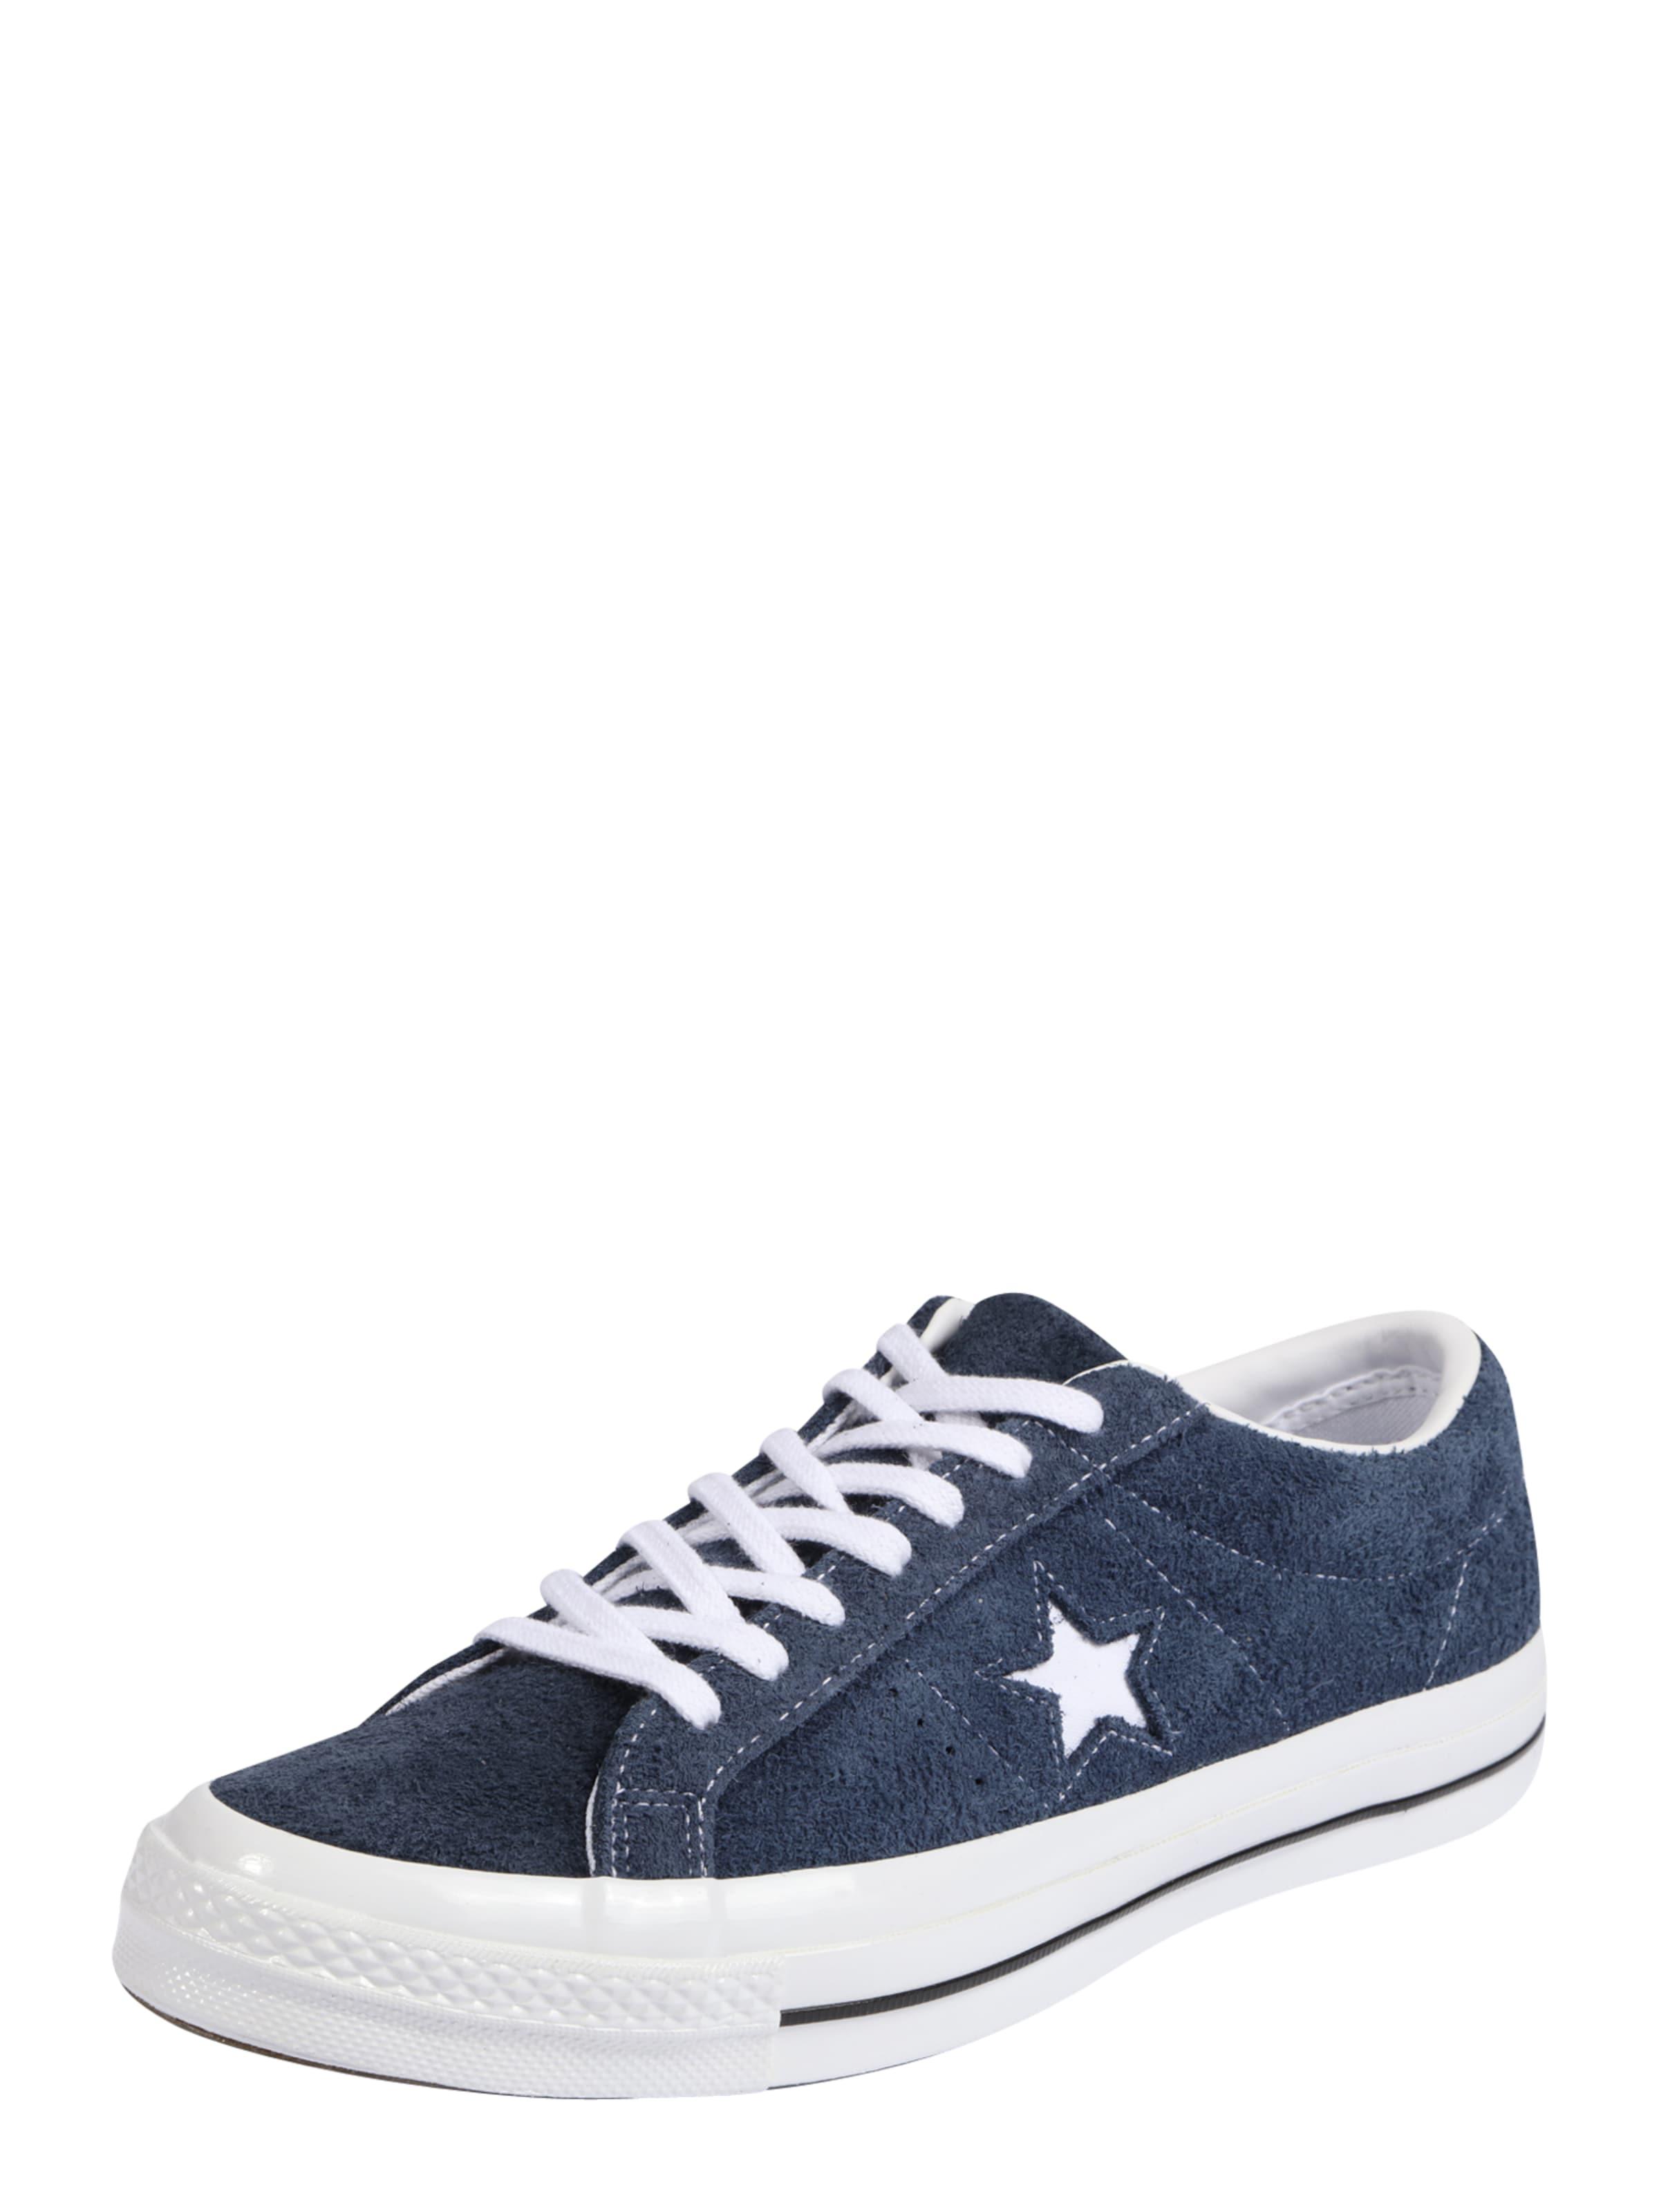 Sneaker Converse 'one Star NachtblauWeiß Ox' In vmNO8n0w